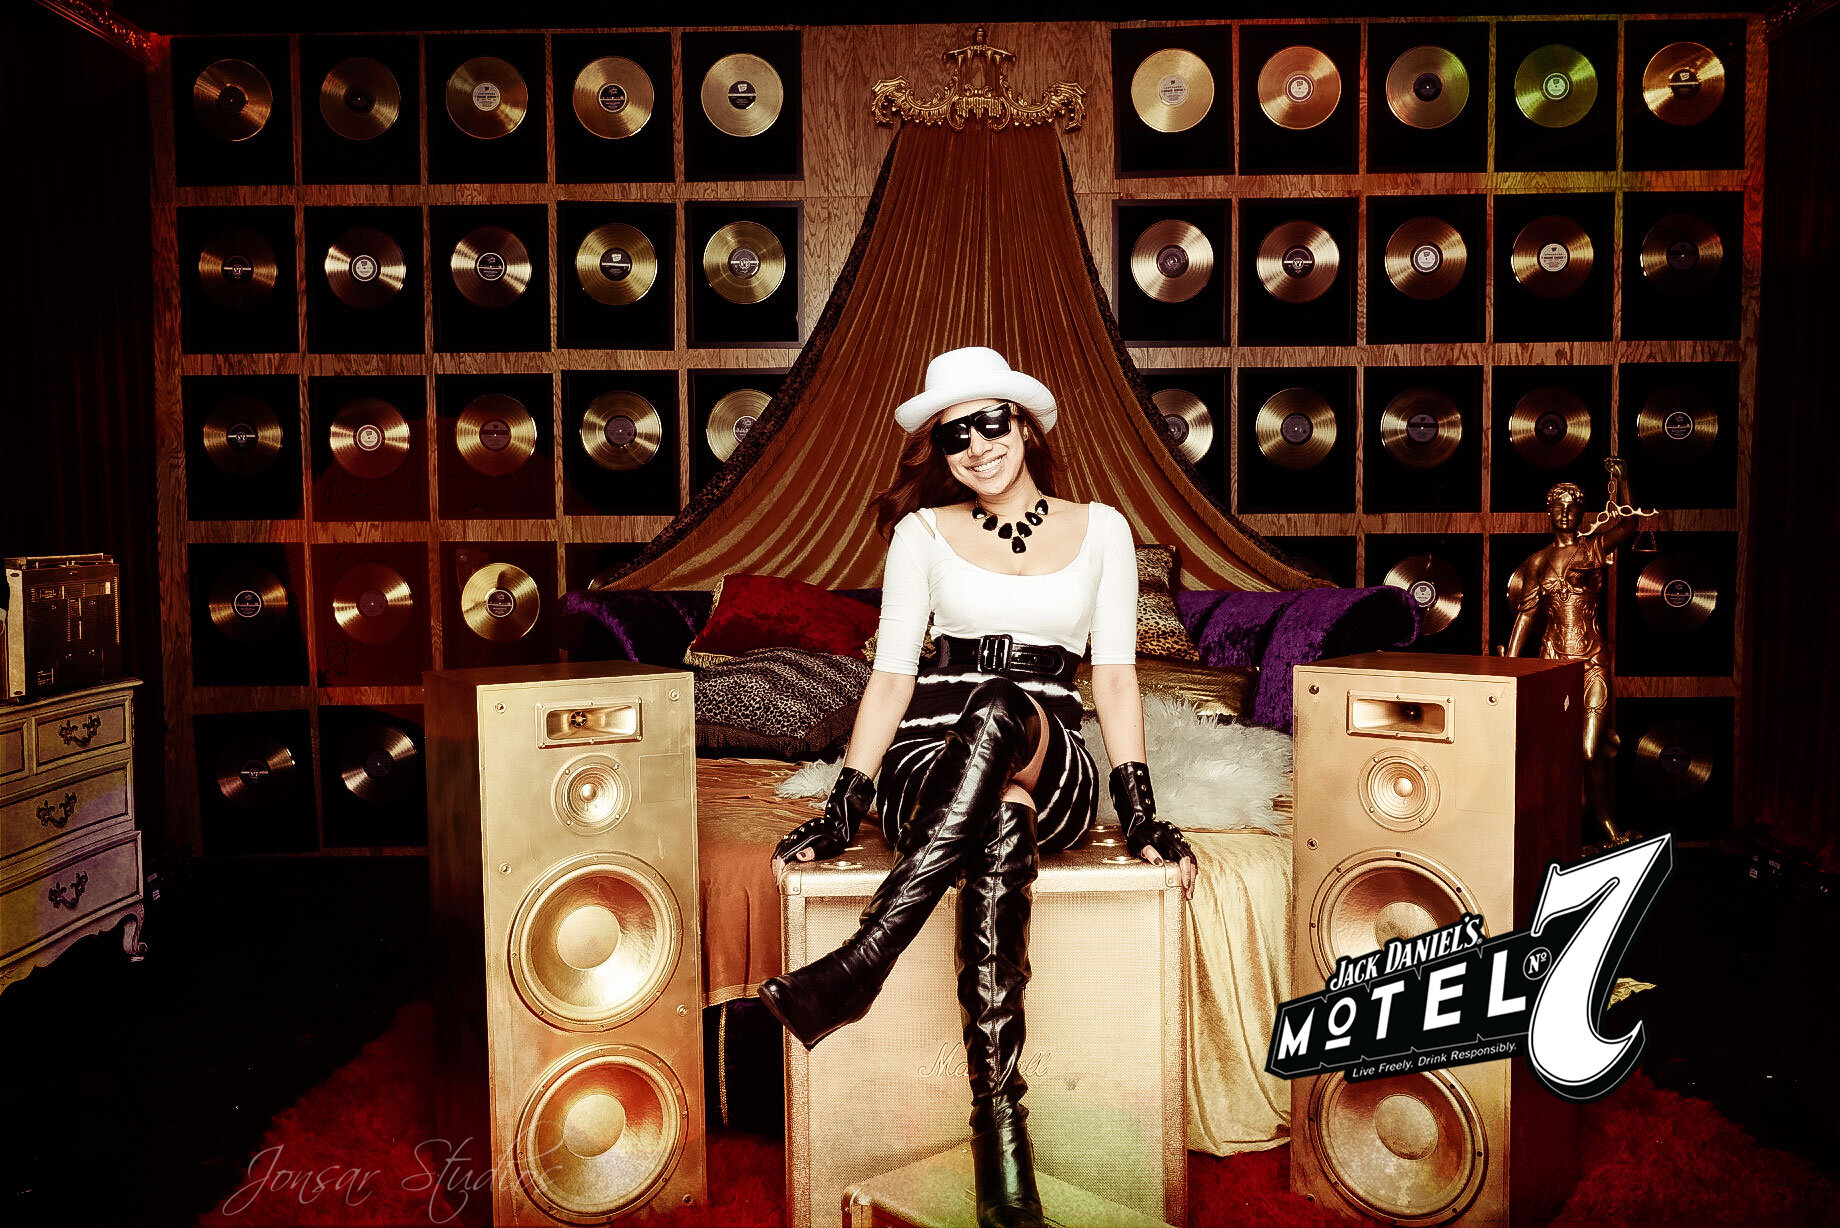 Girl wearing knee high black boots in rockstar themed hotel room